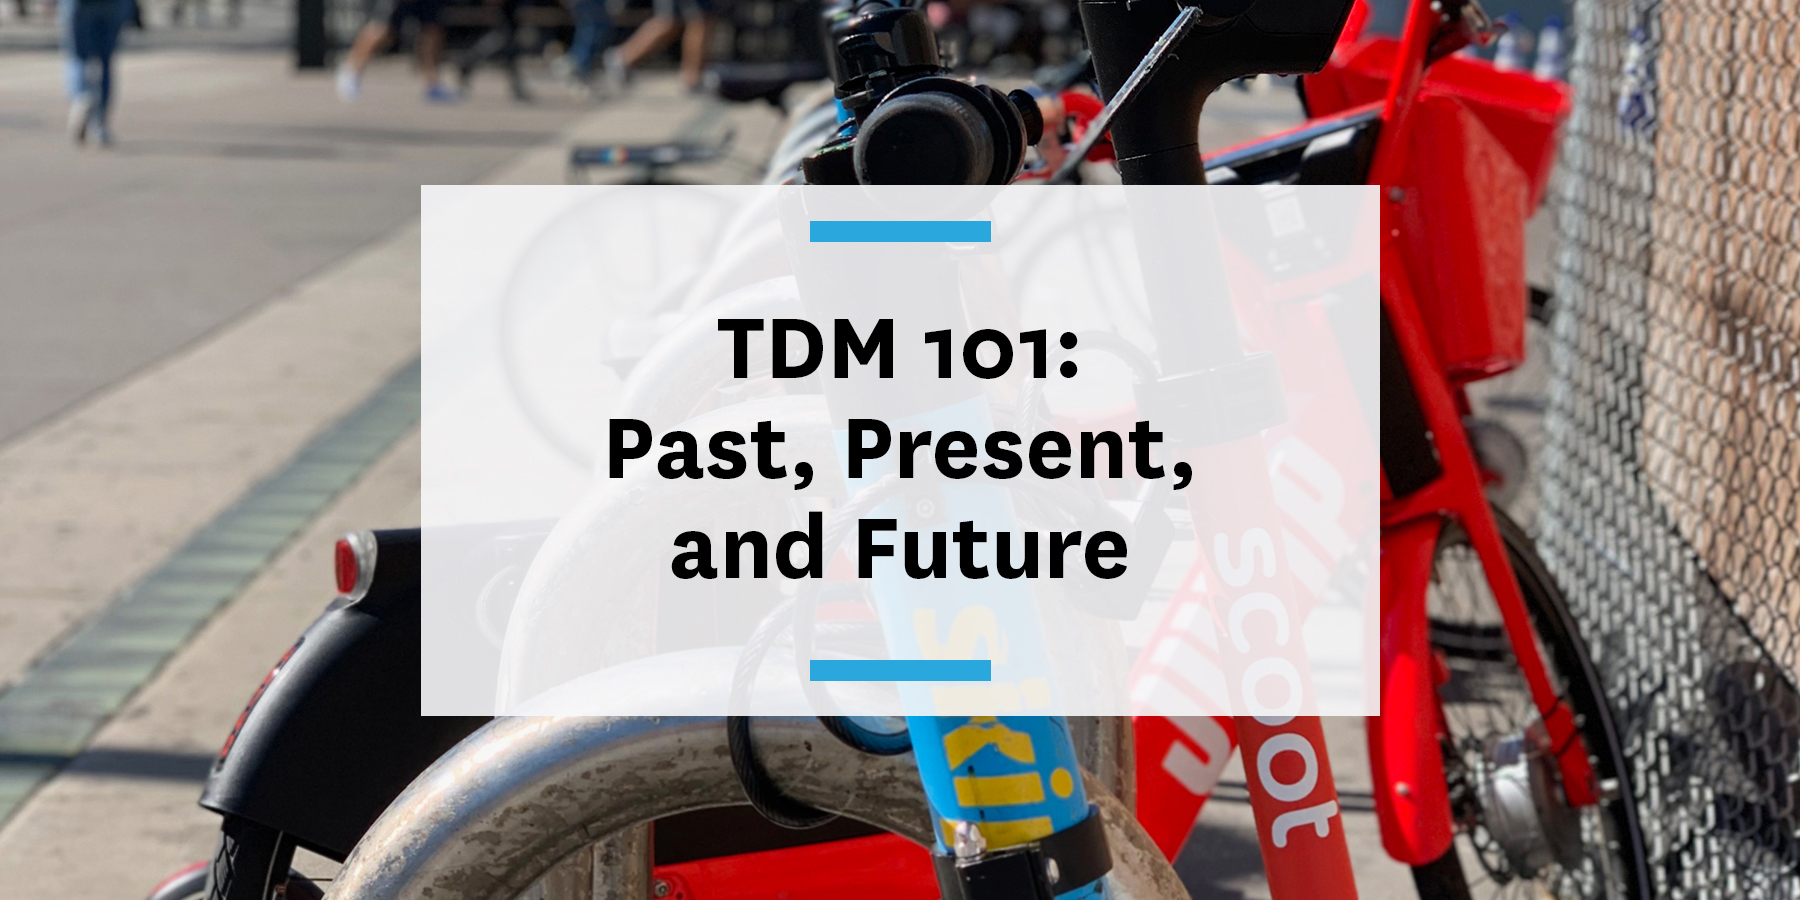 Transportation Demand Management (TDM) 101 and improving commute management strategies